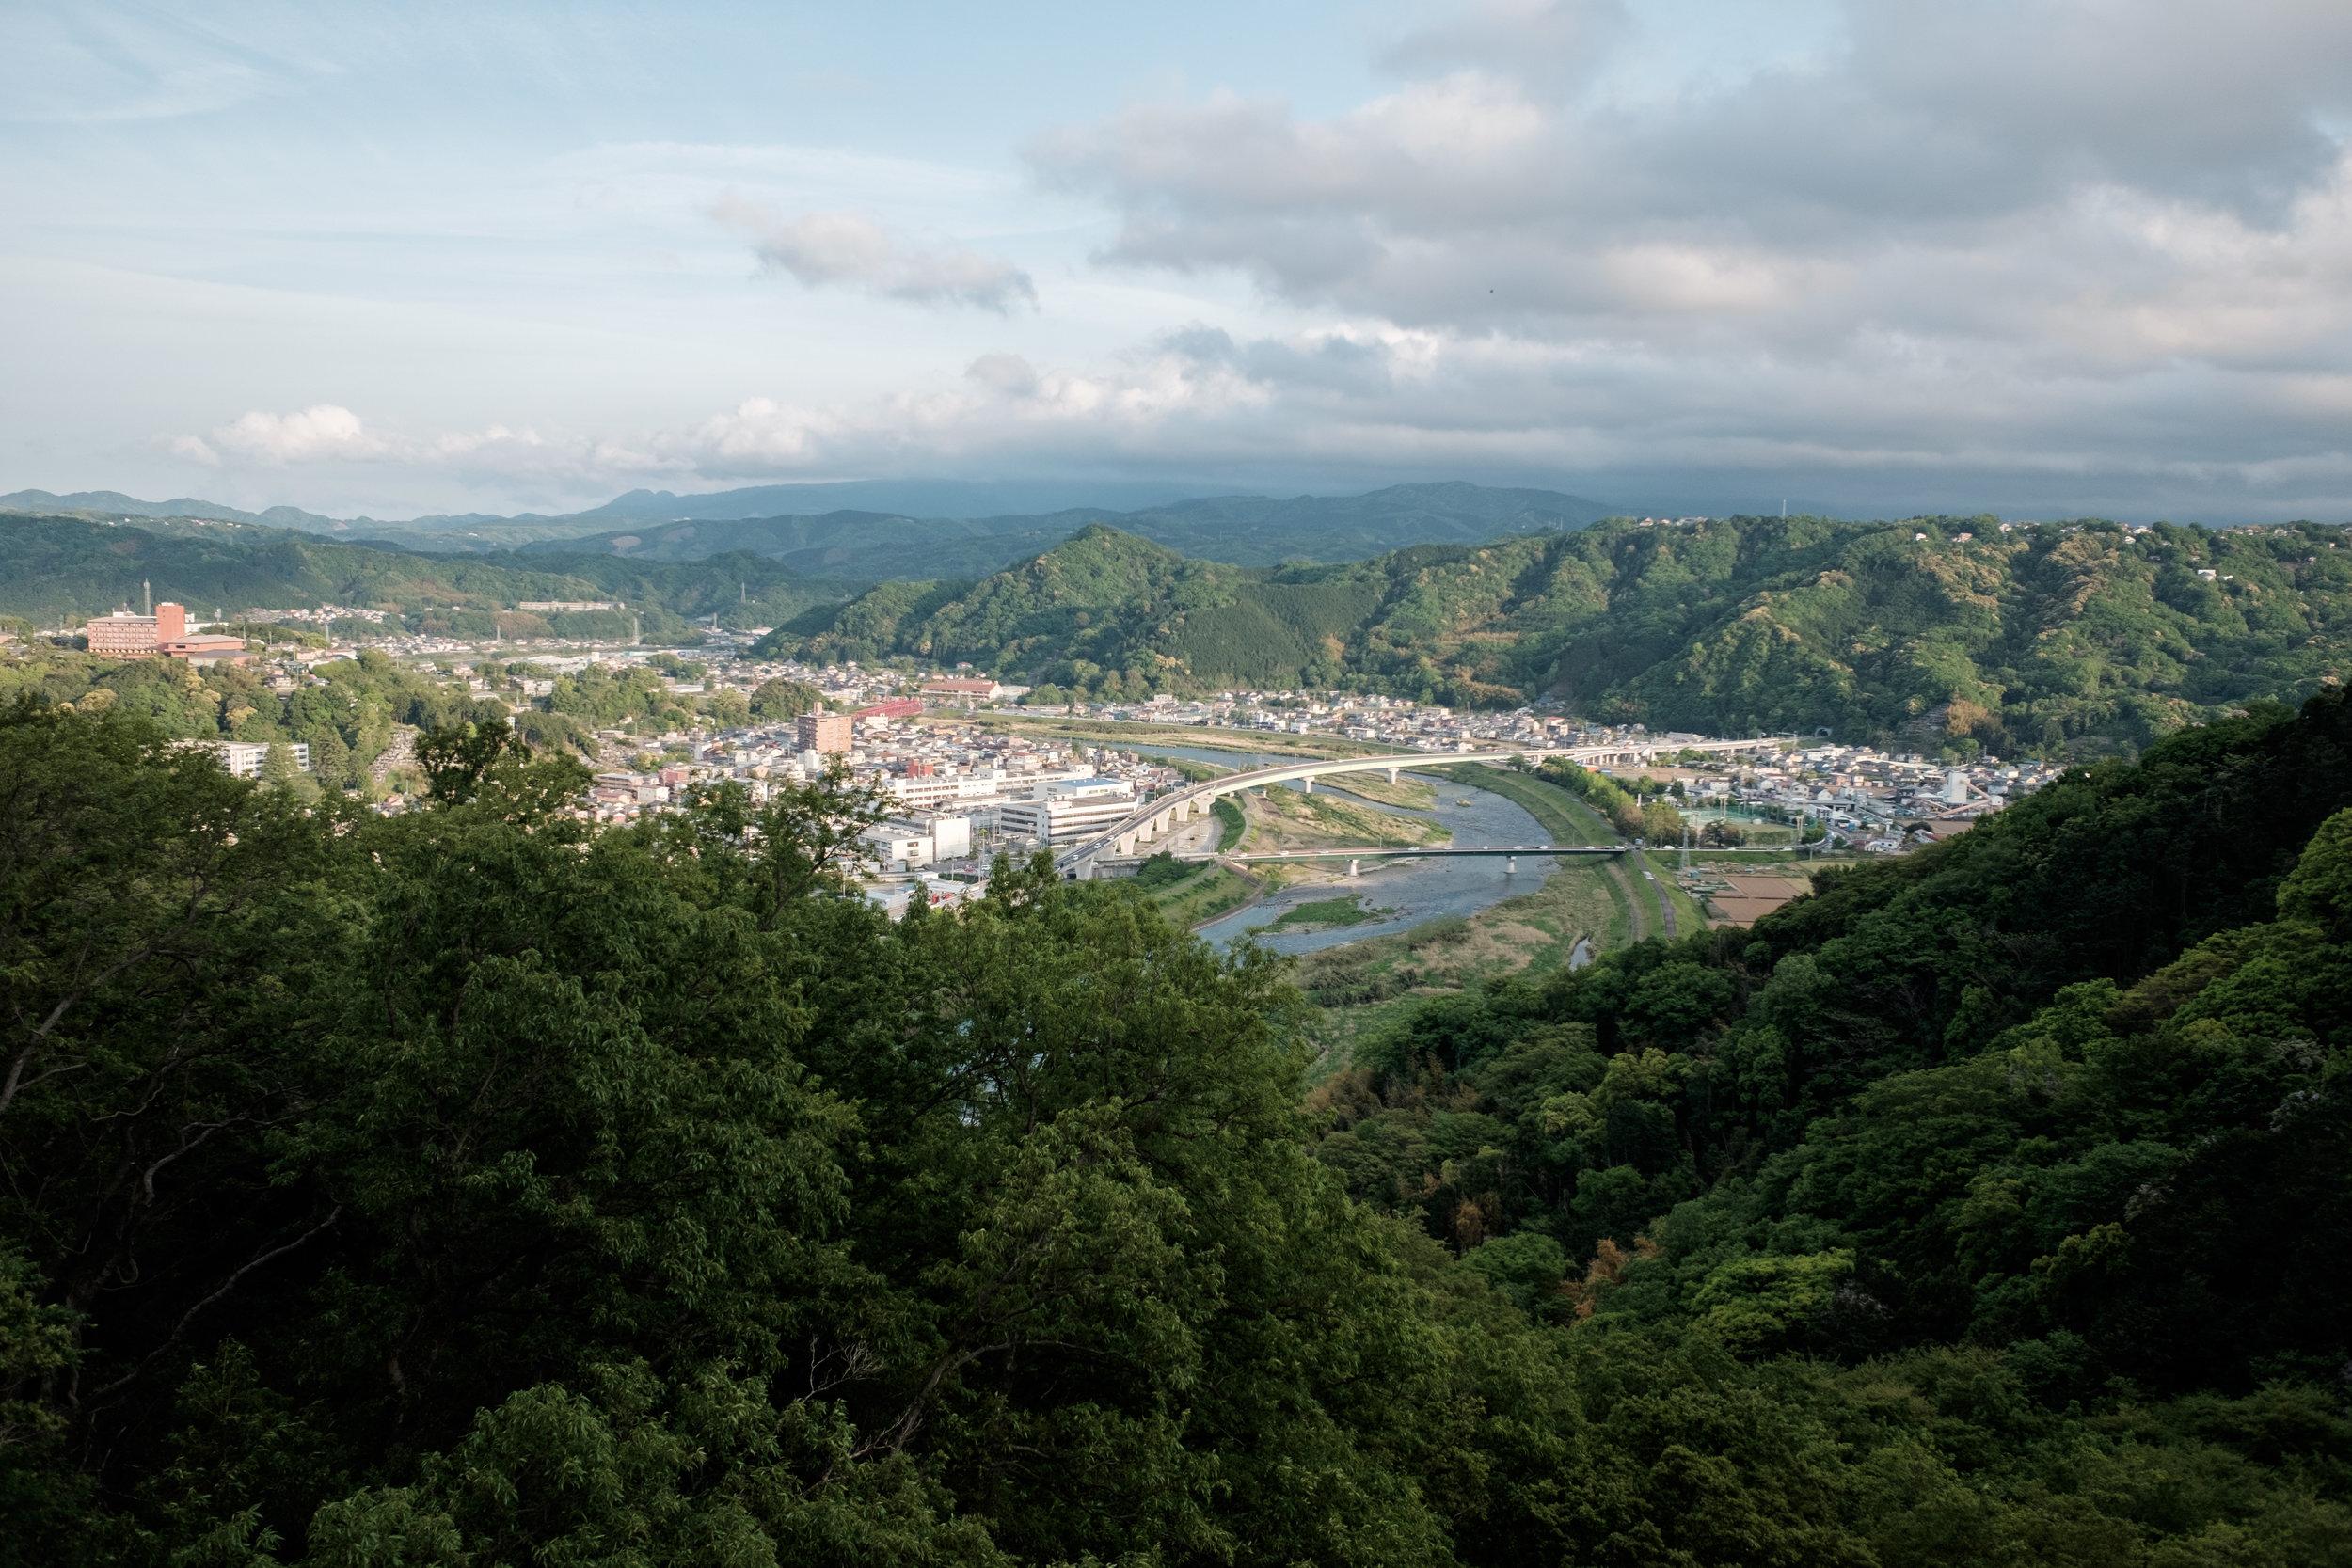 View of Joyama City